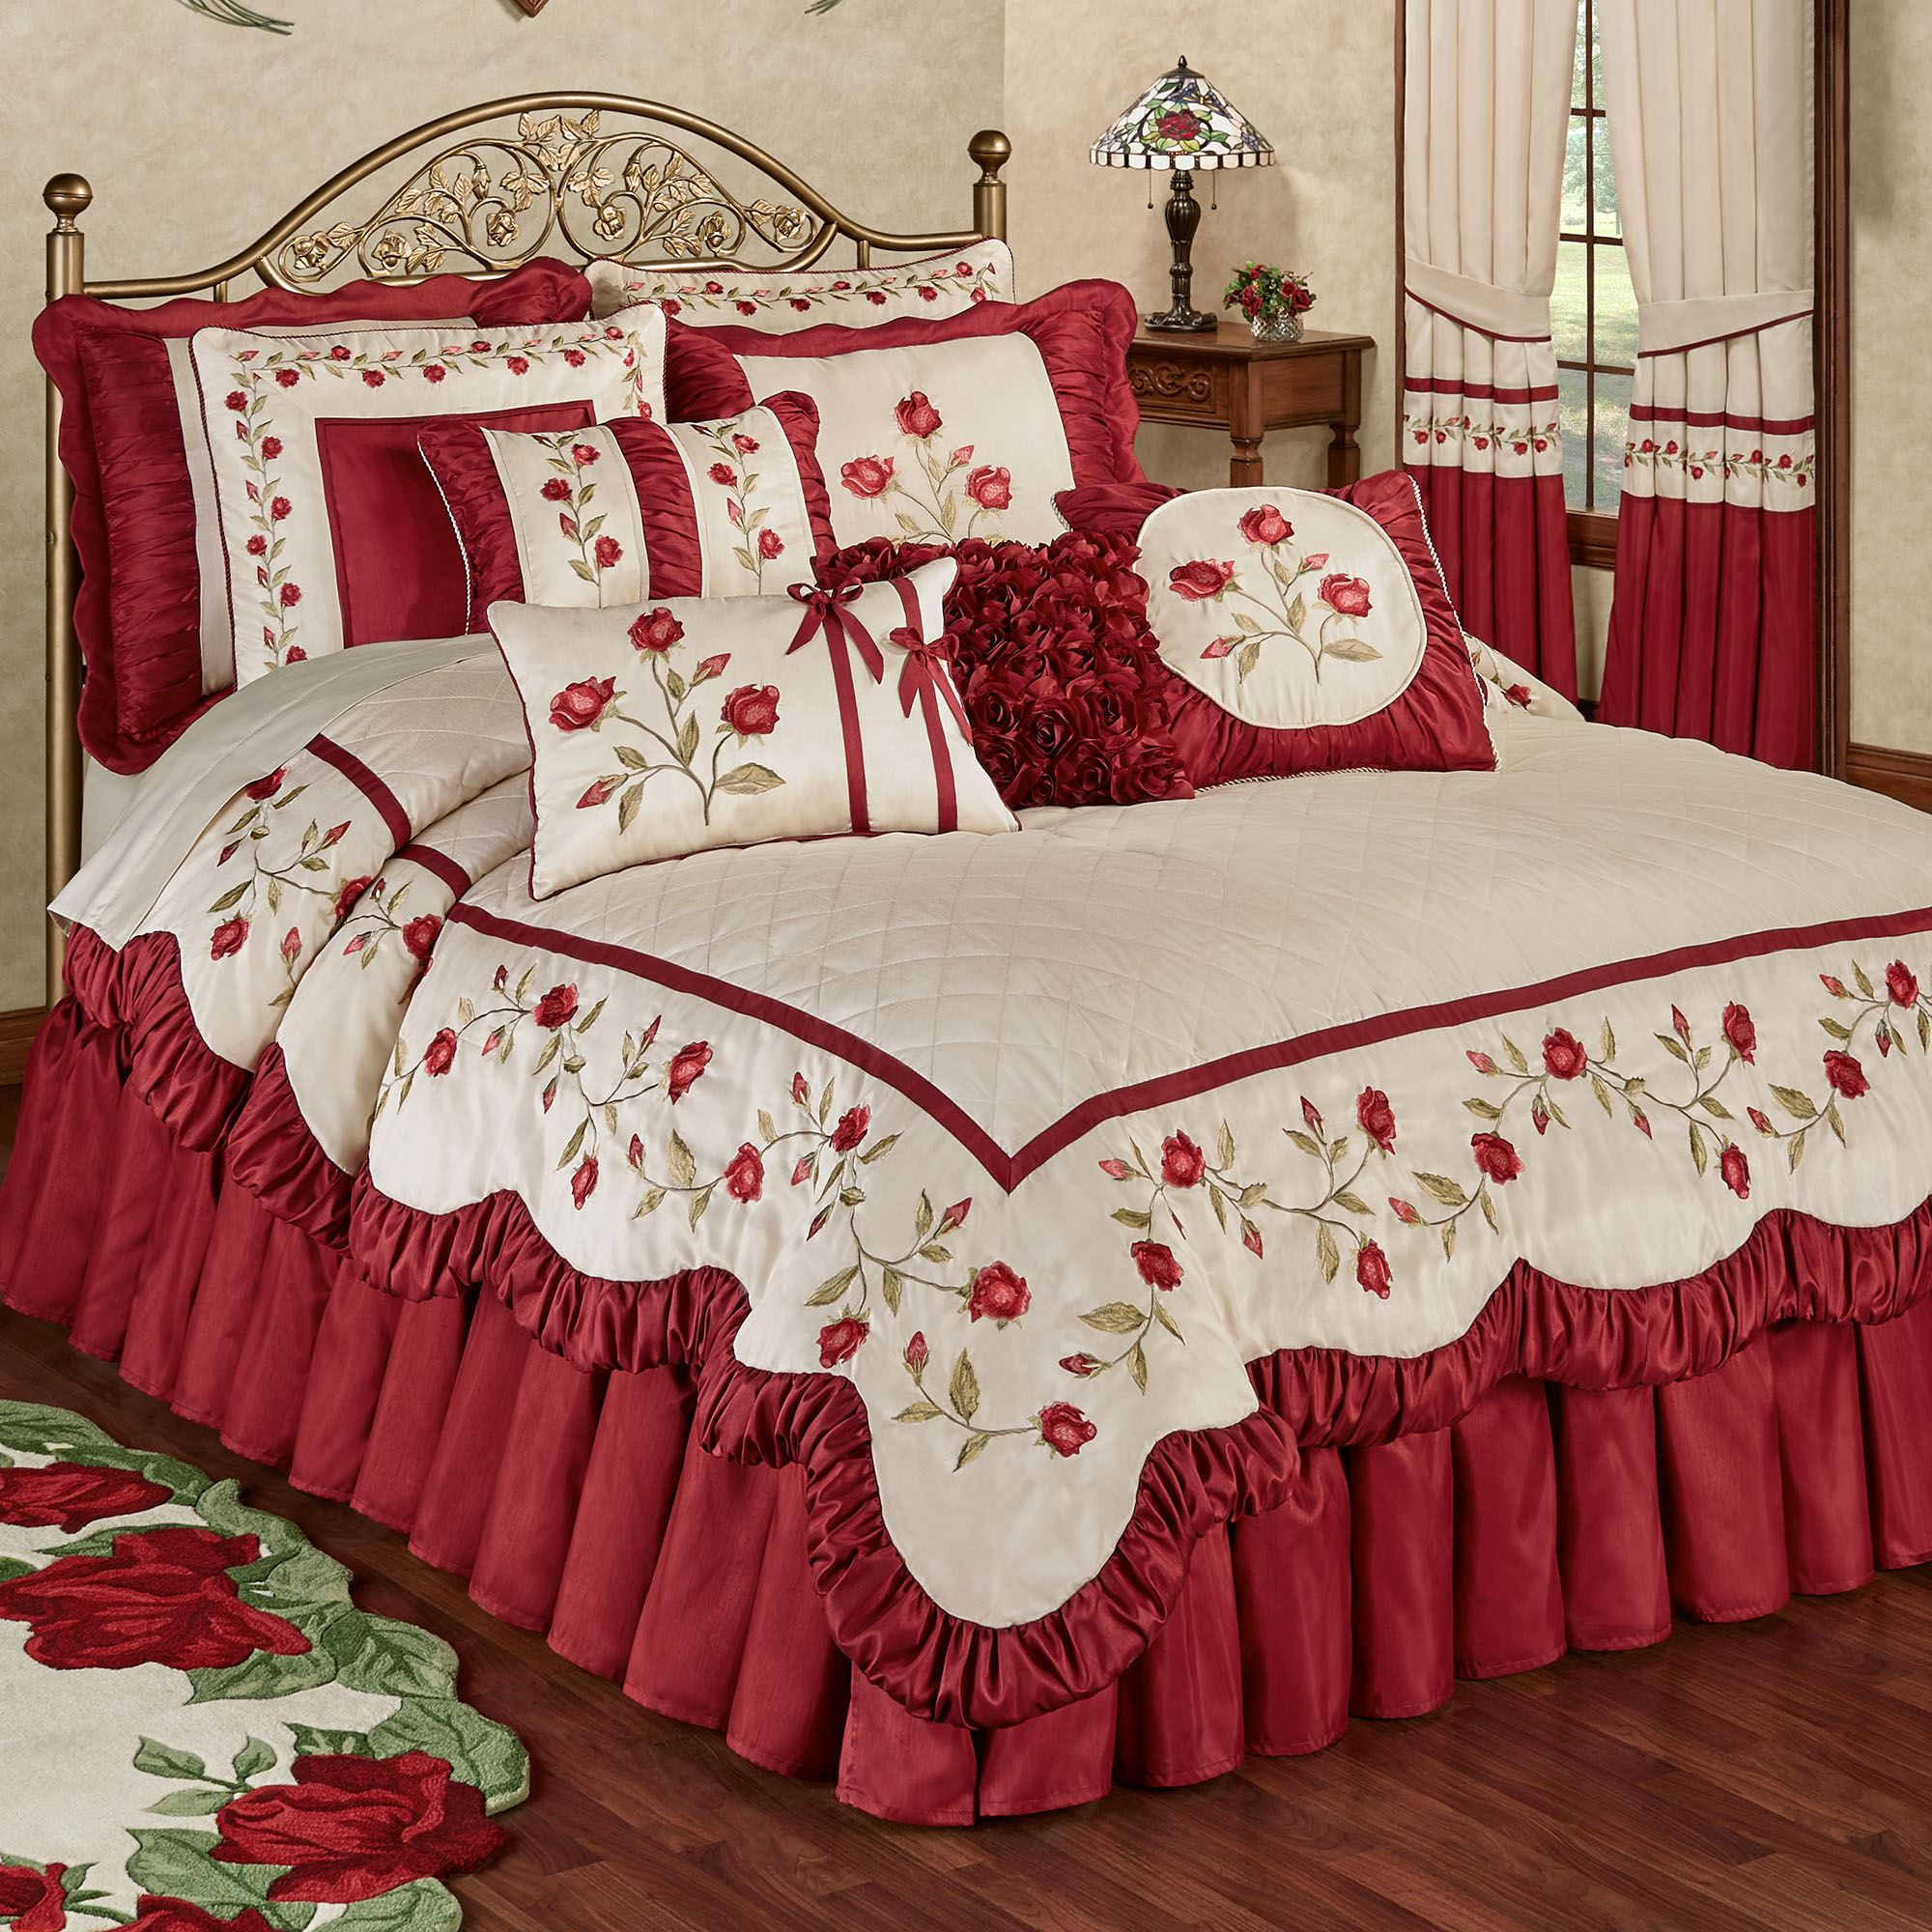 Briar Rose Dark Red Floral Romantic Comforter Bedding